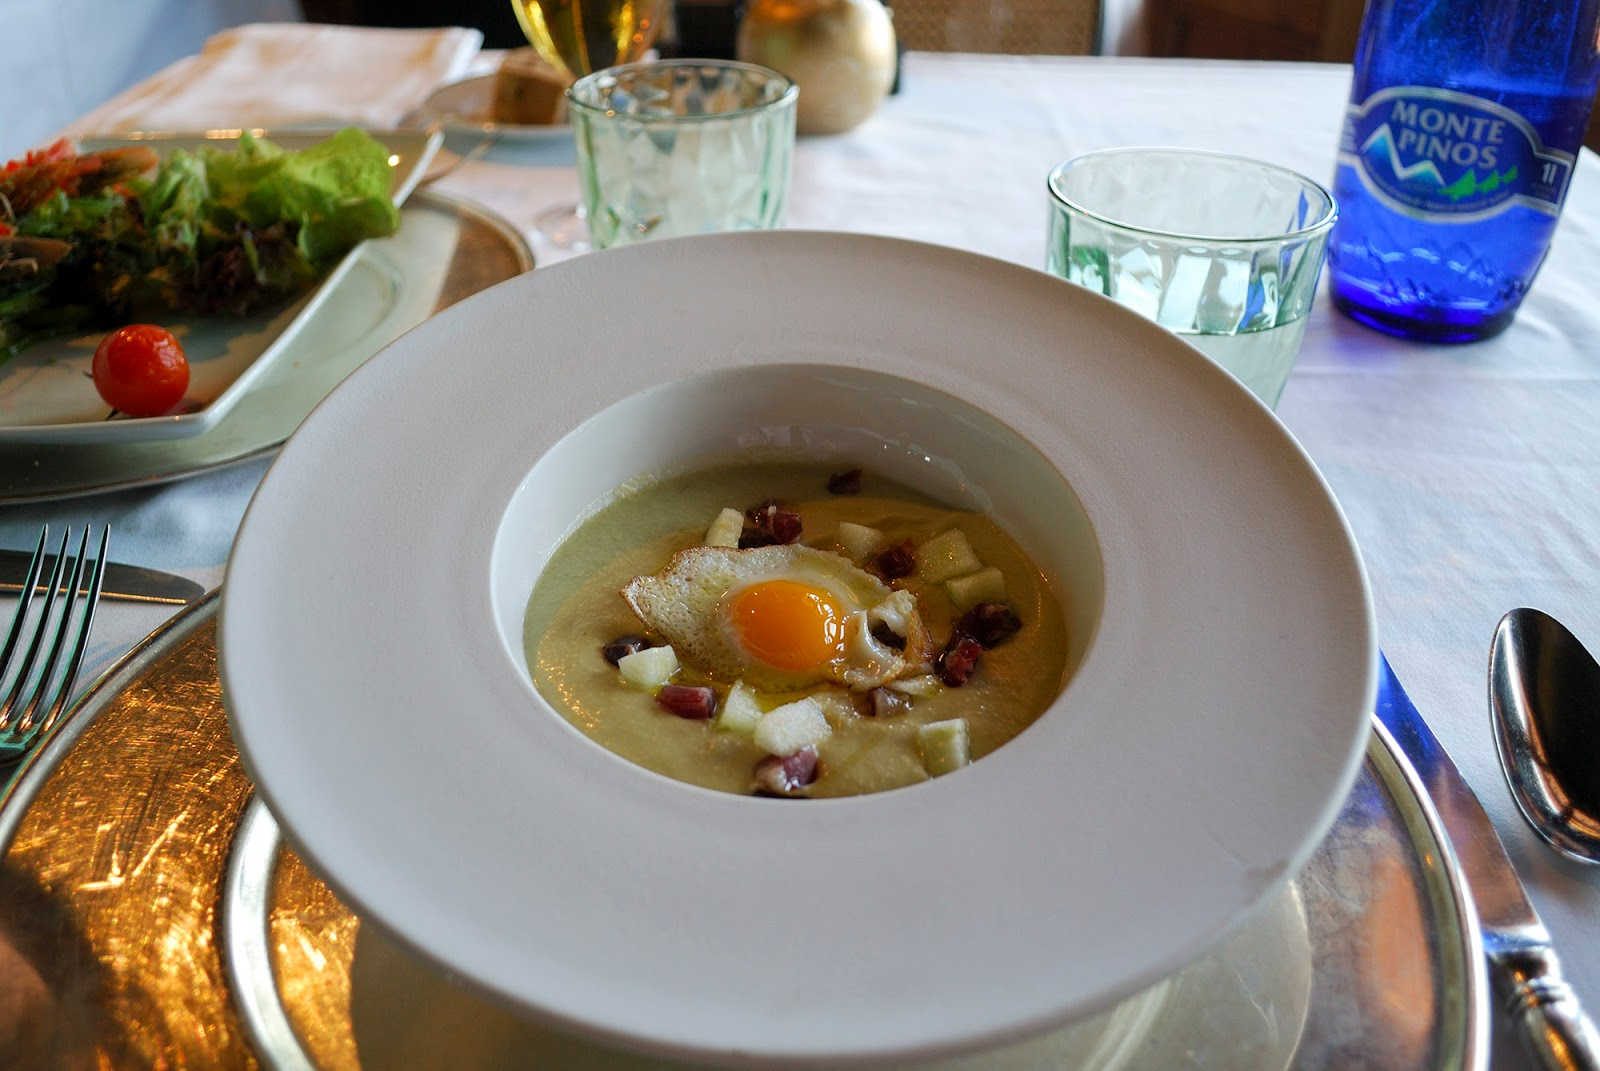 parador toledo spain hotel luxury restaurant vantage point restaurant food menu